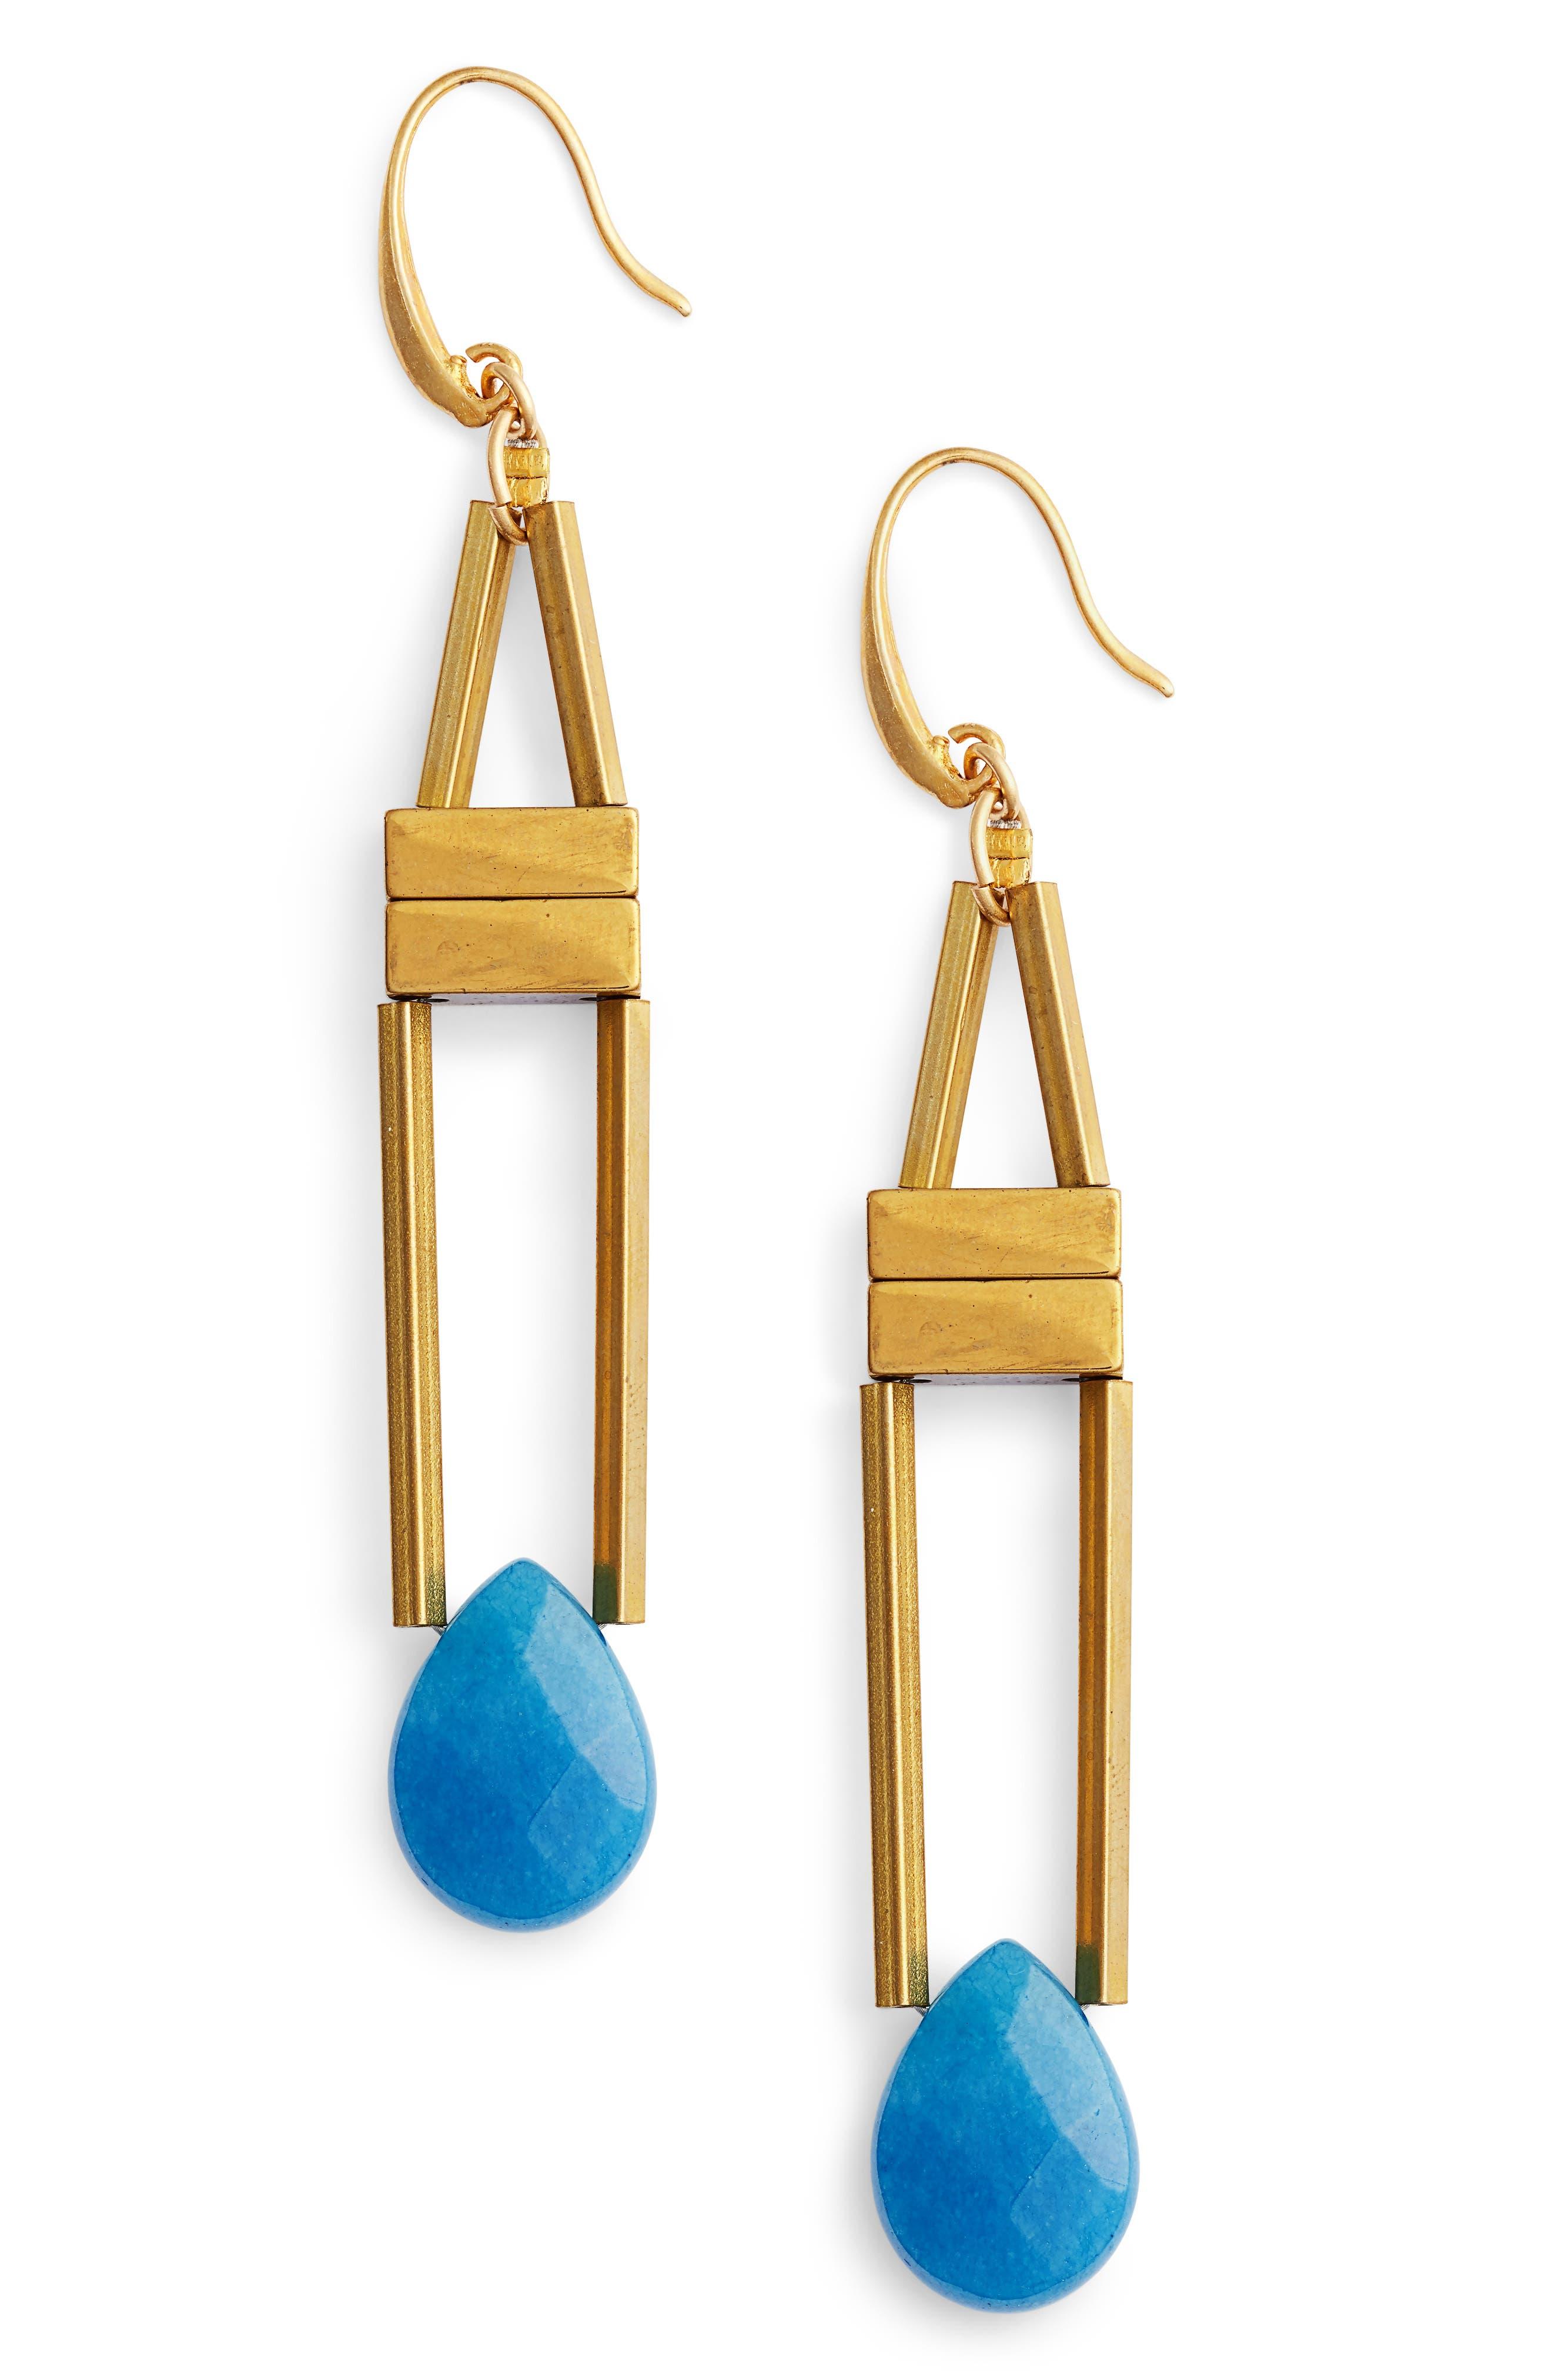 Rylee Beaded Tassel Earrings,                         Main,                         color, Blue/ Gold